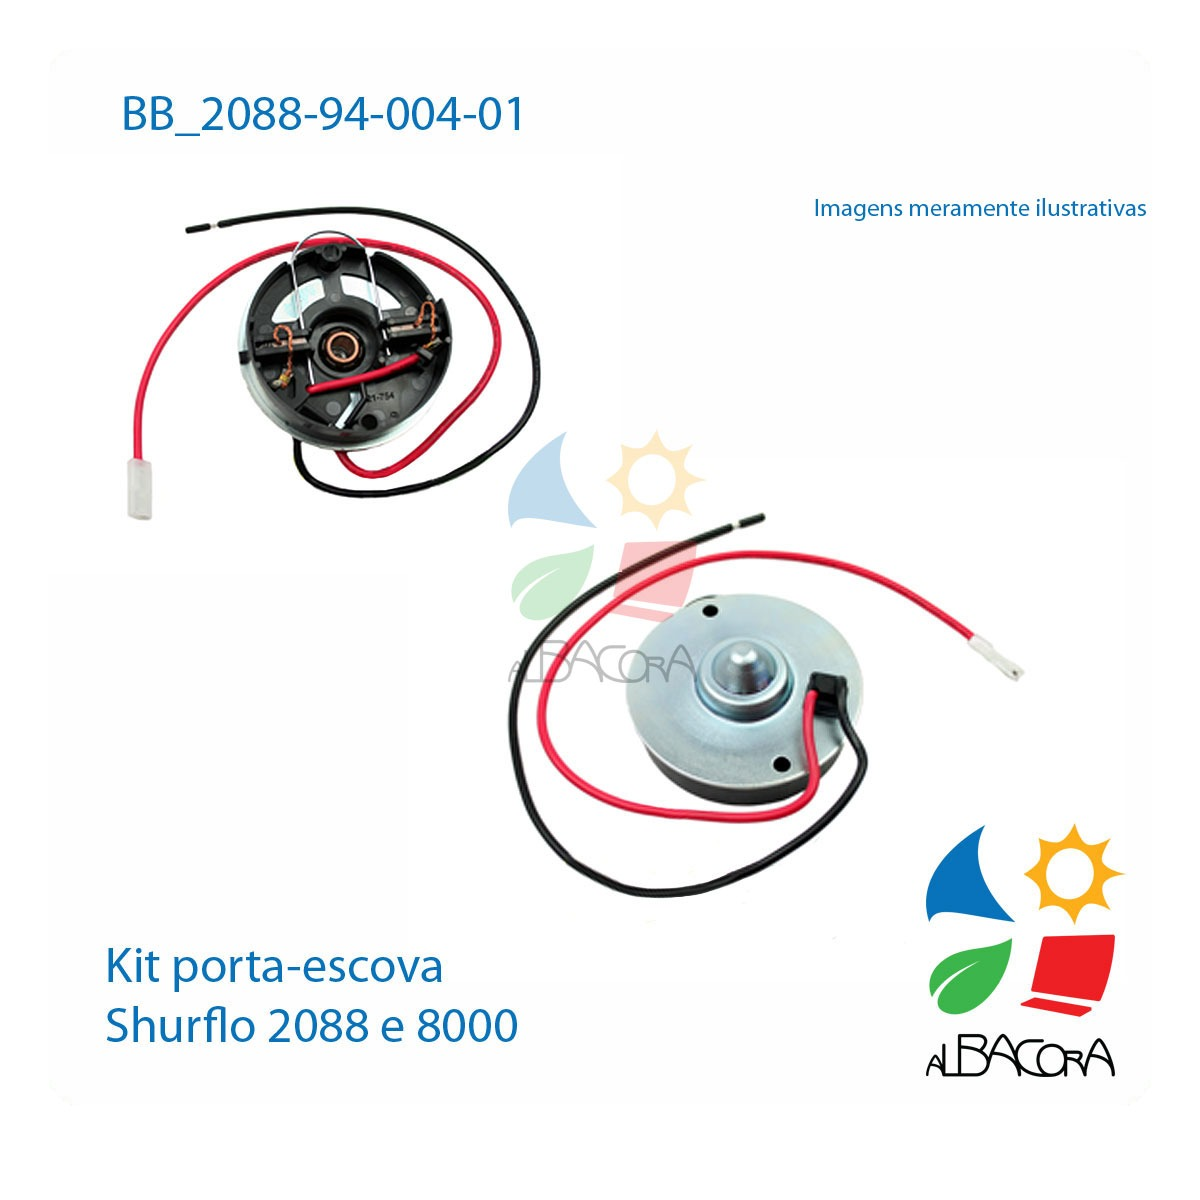 KIT TAMPA PORTA ESCOVA SHURFLO  2088 E 8000 94-004-01